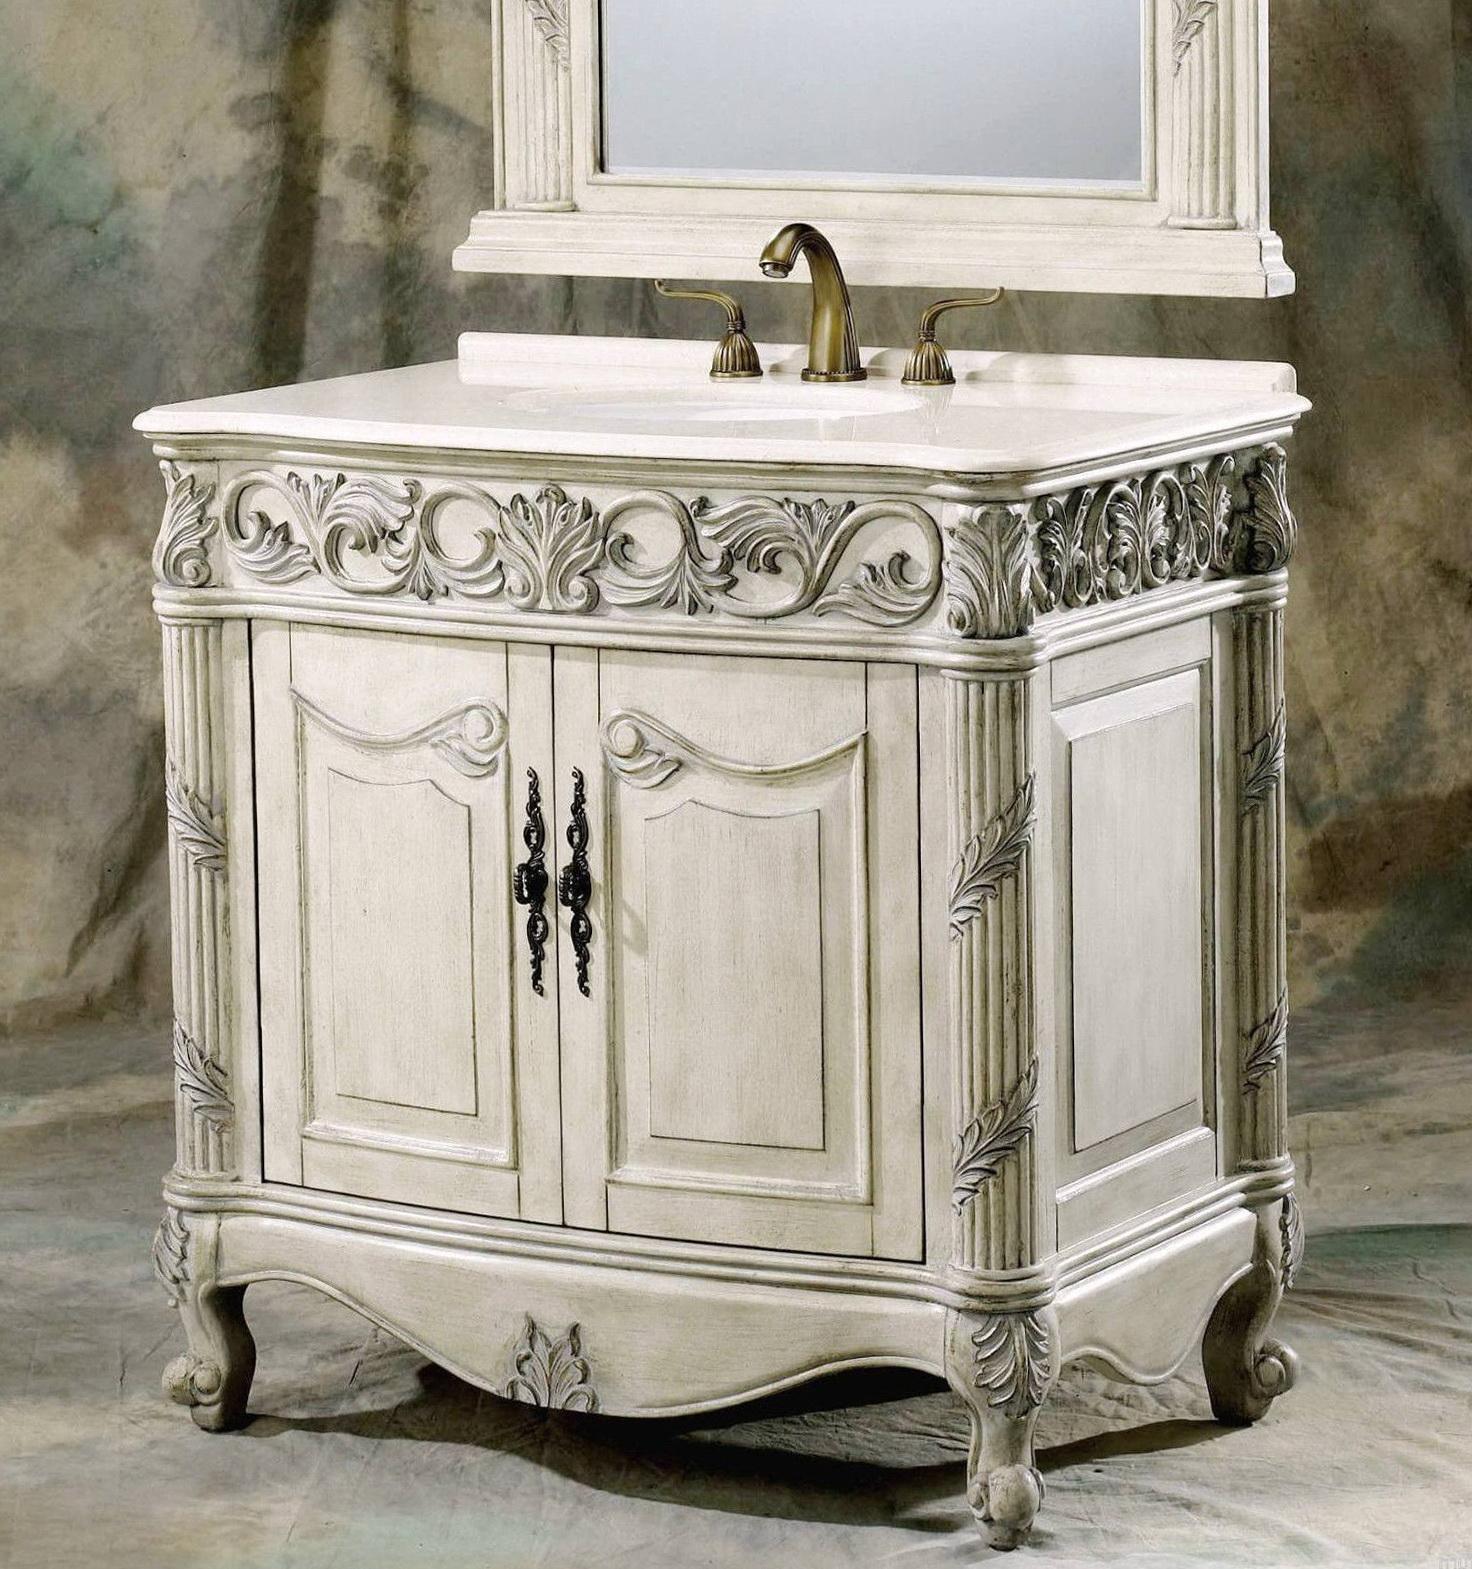 43 Inch Vanity Top For Bathroom